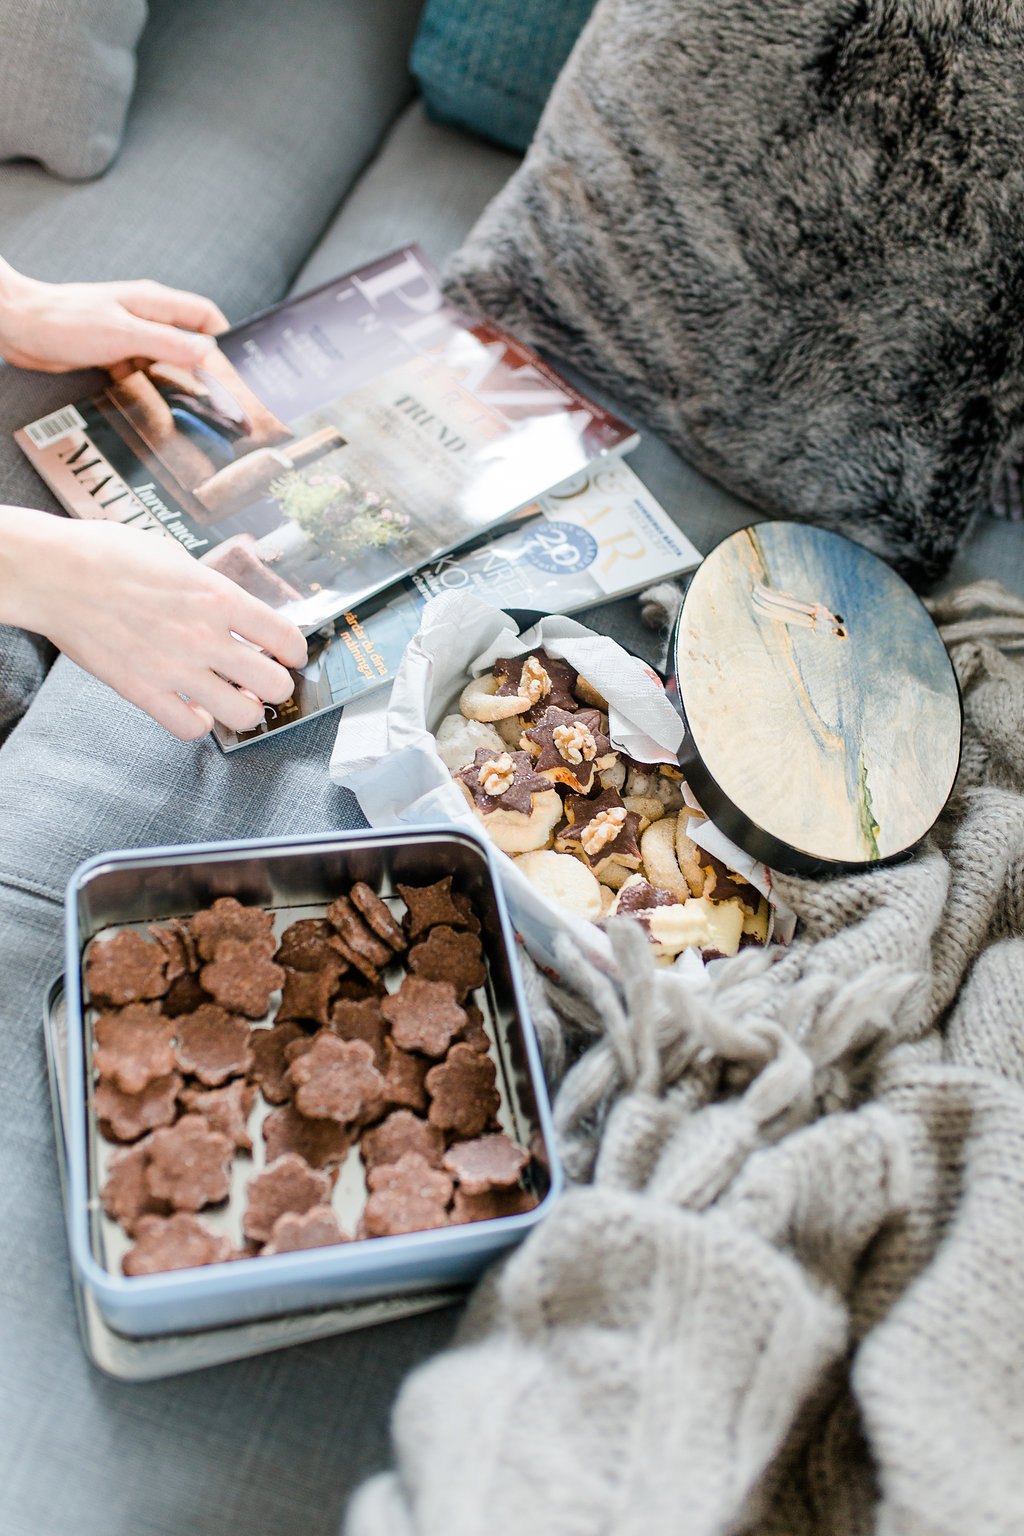 Sofia CM Scandinavian Interior blog -  Swiss Christmas Cookies